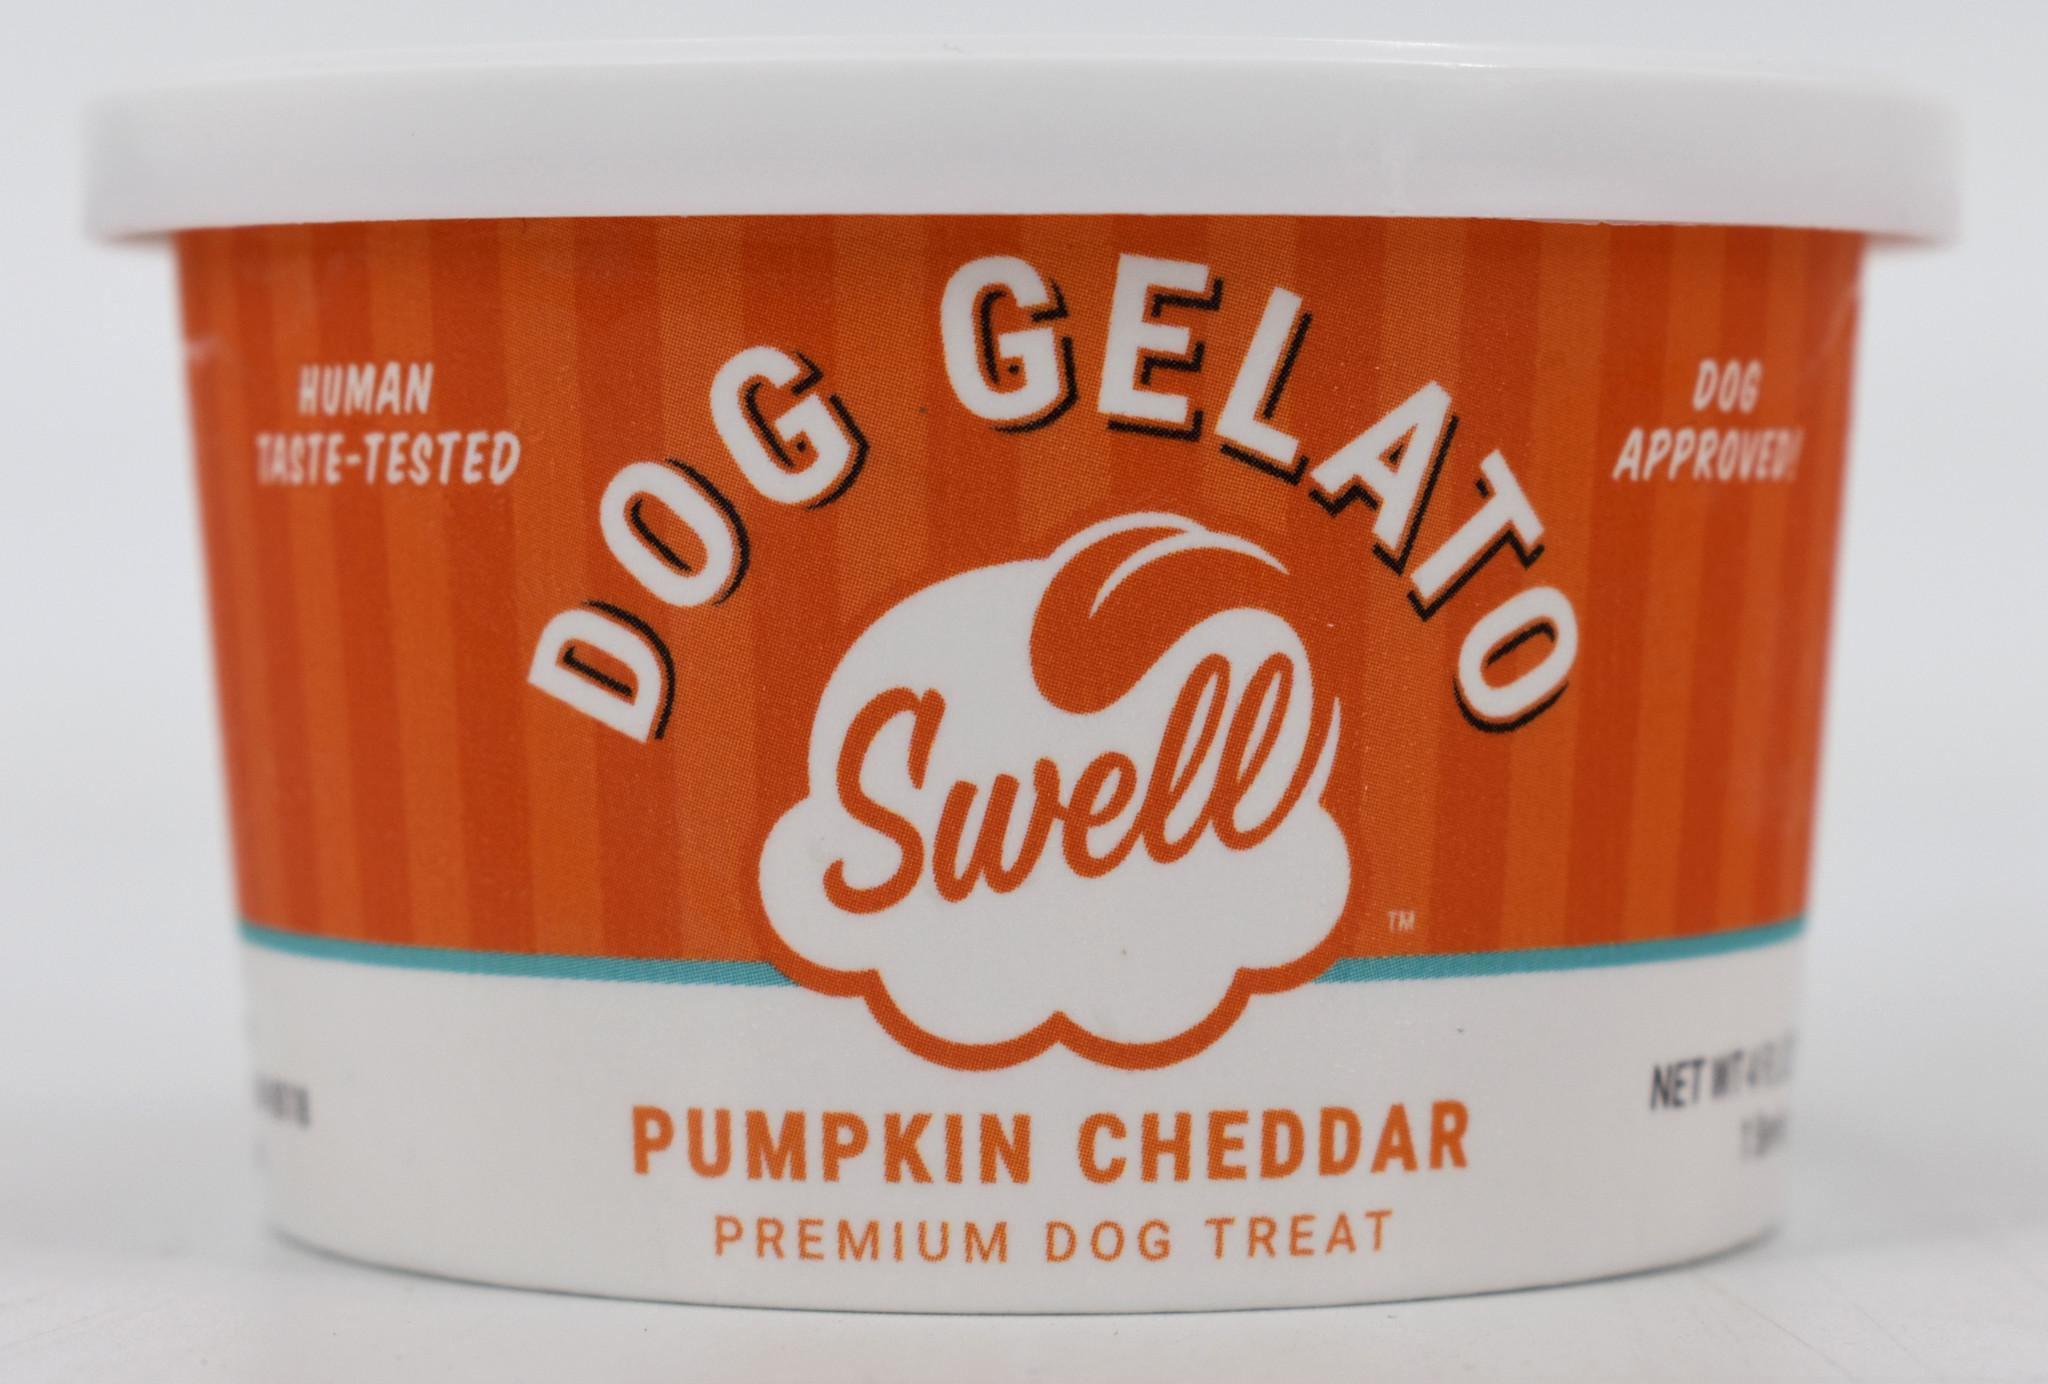 Swell Swell Gelato Pumpkin Cheddar Frozen Dog Treat